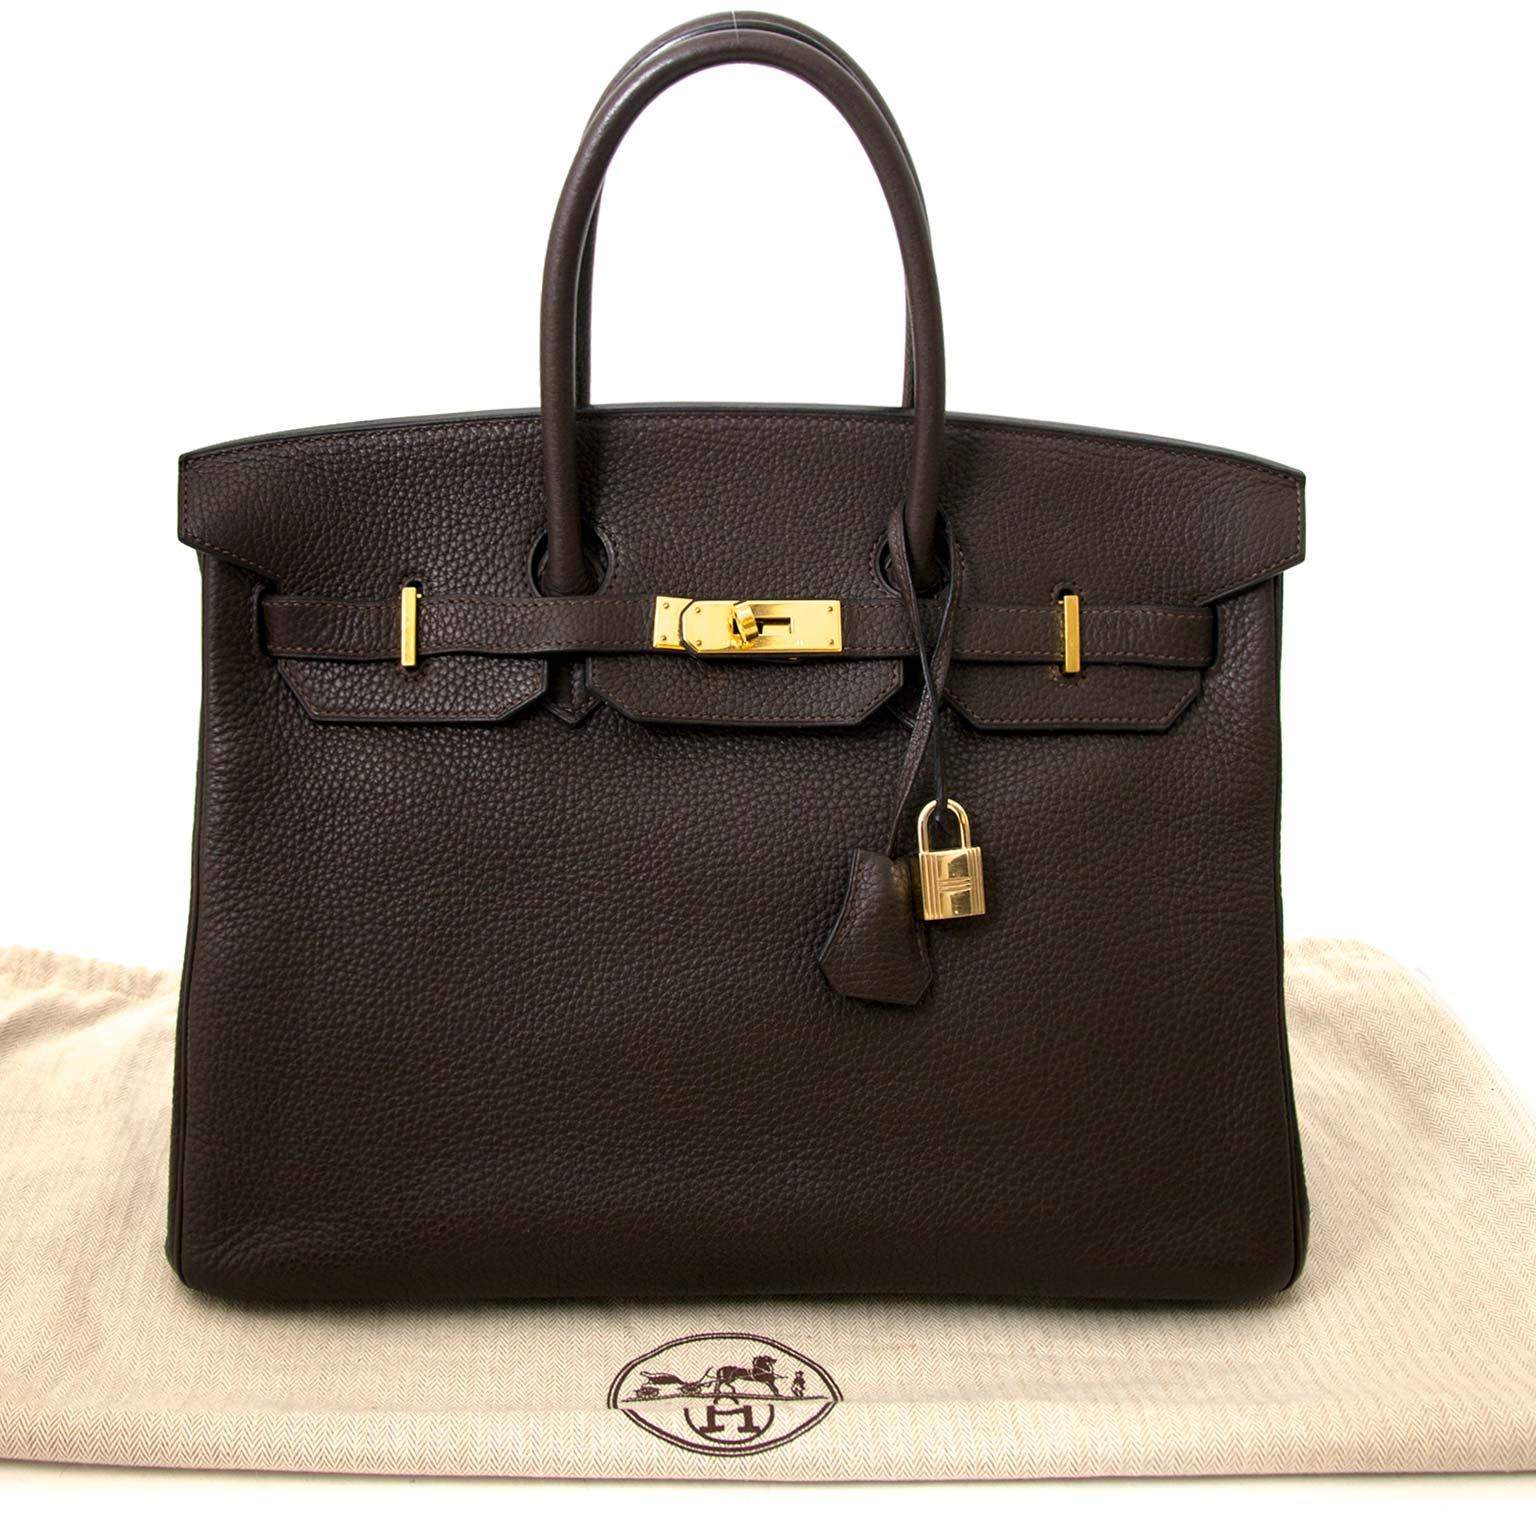 Koop authentieke Hermès birkins bij Labellov vintage mode webshop